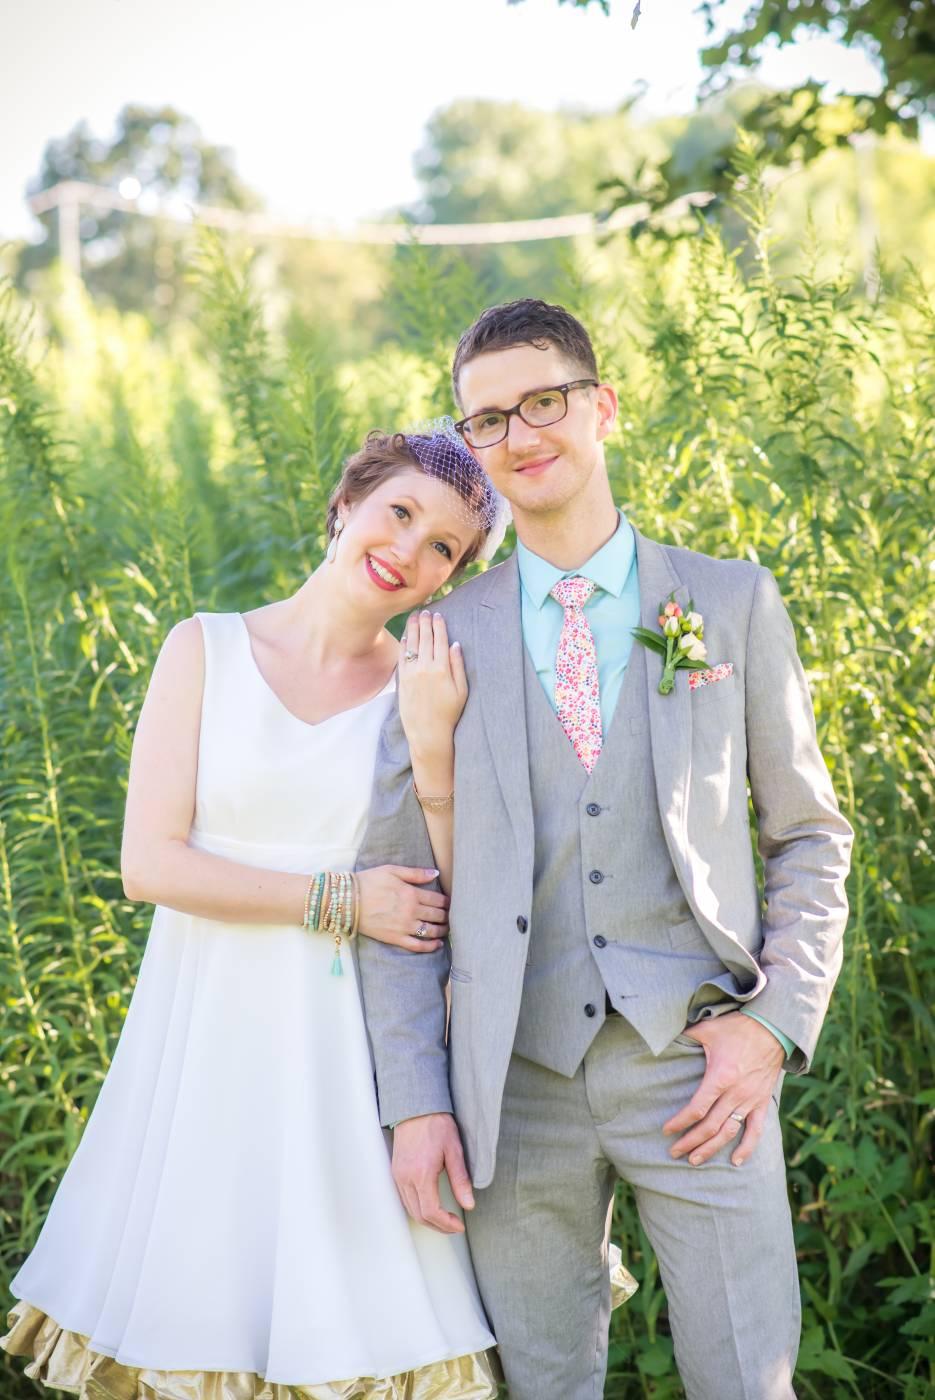 Wedding Photography by Tanya Sinnett